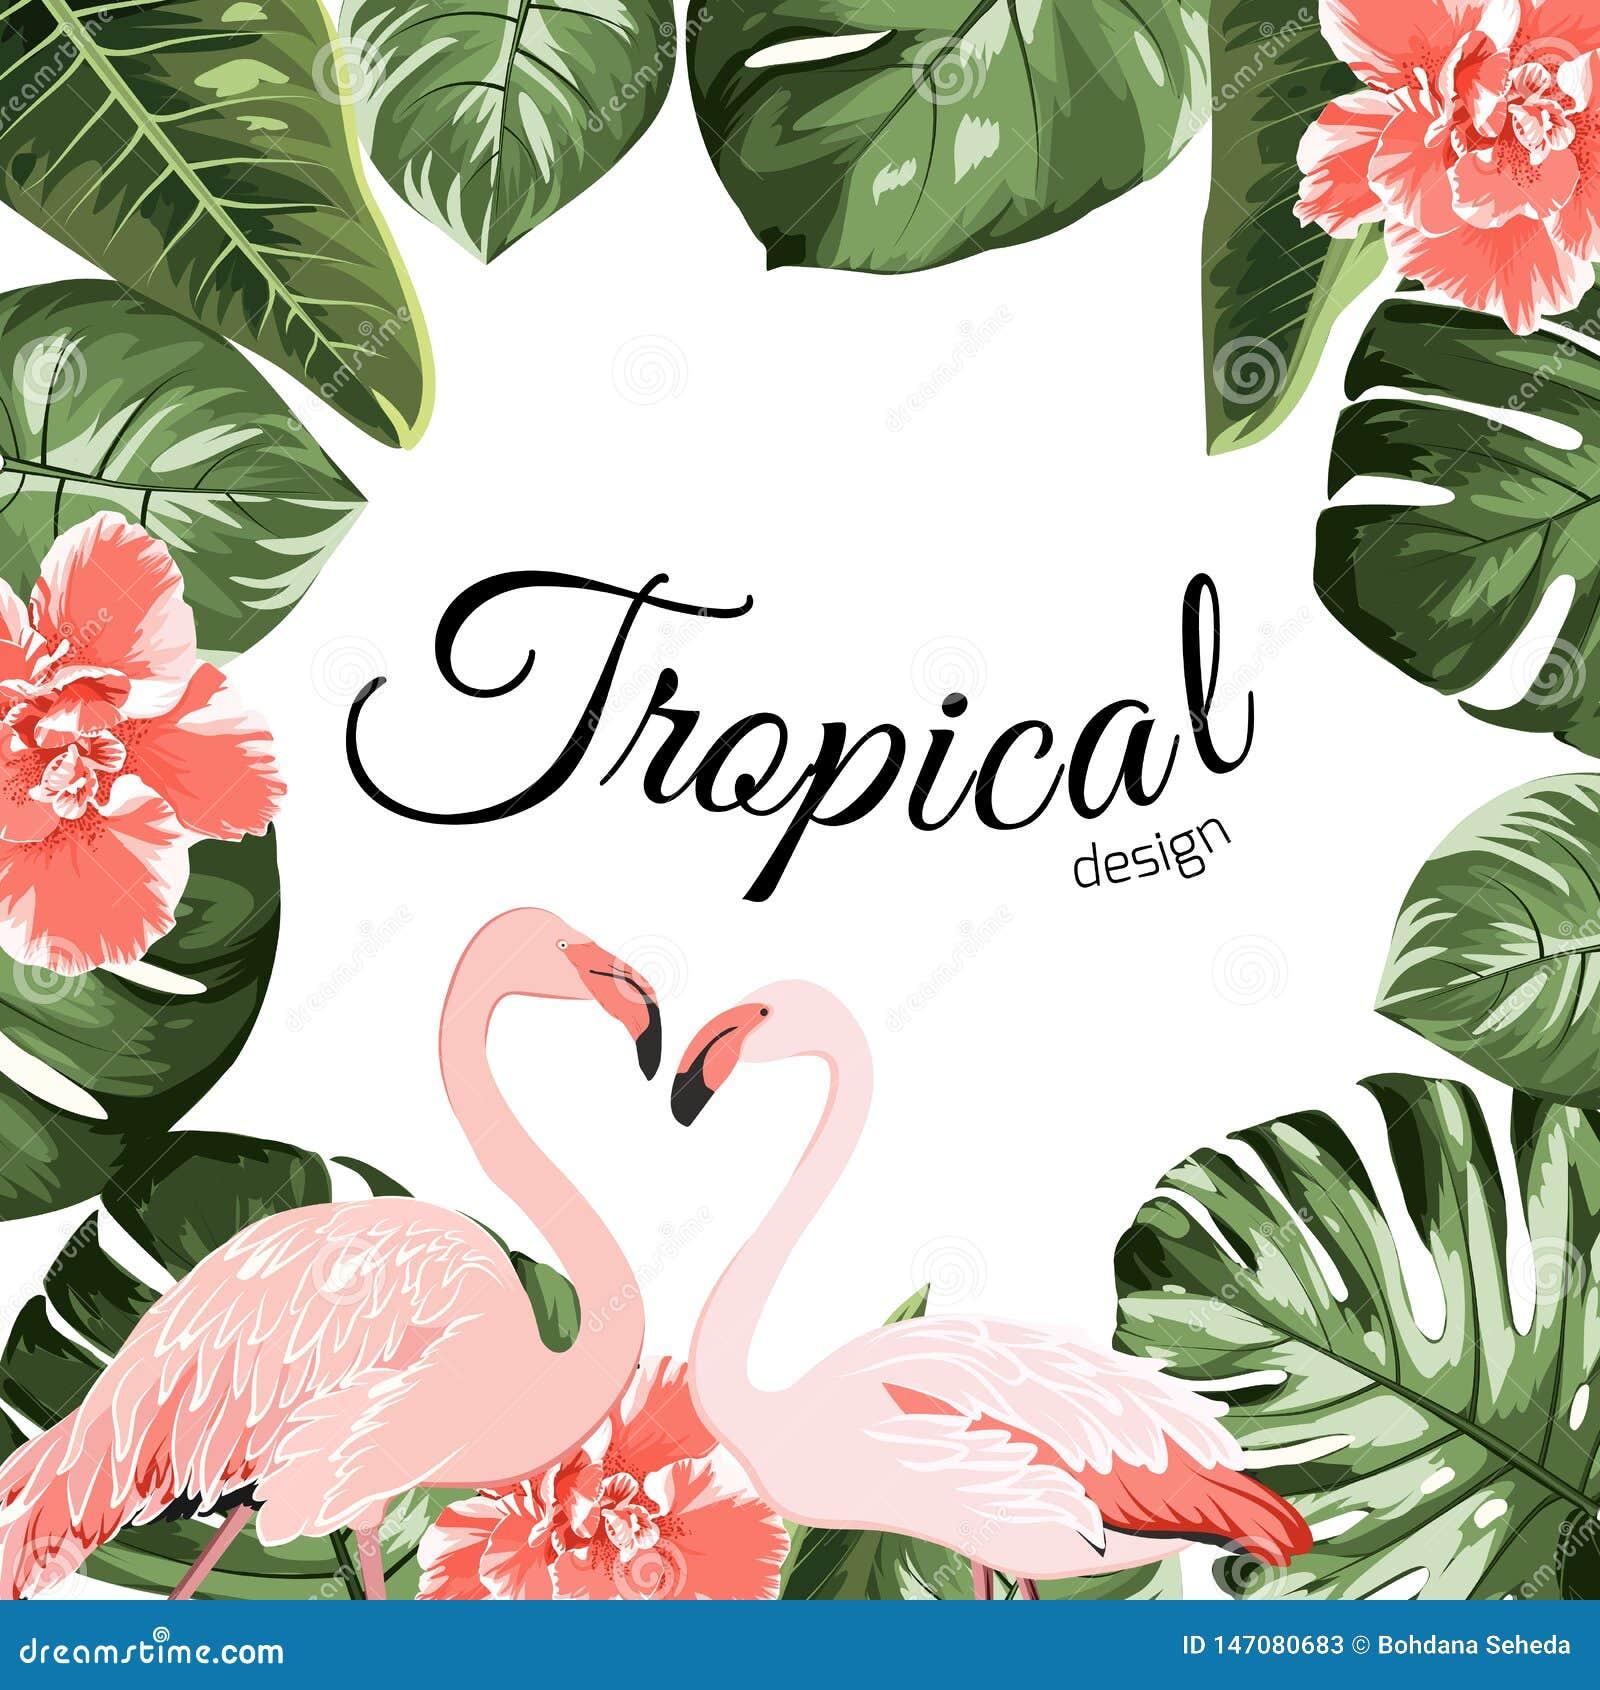 Tropical event invitation card template